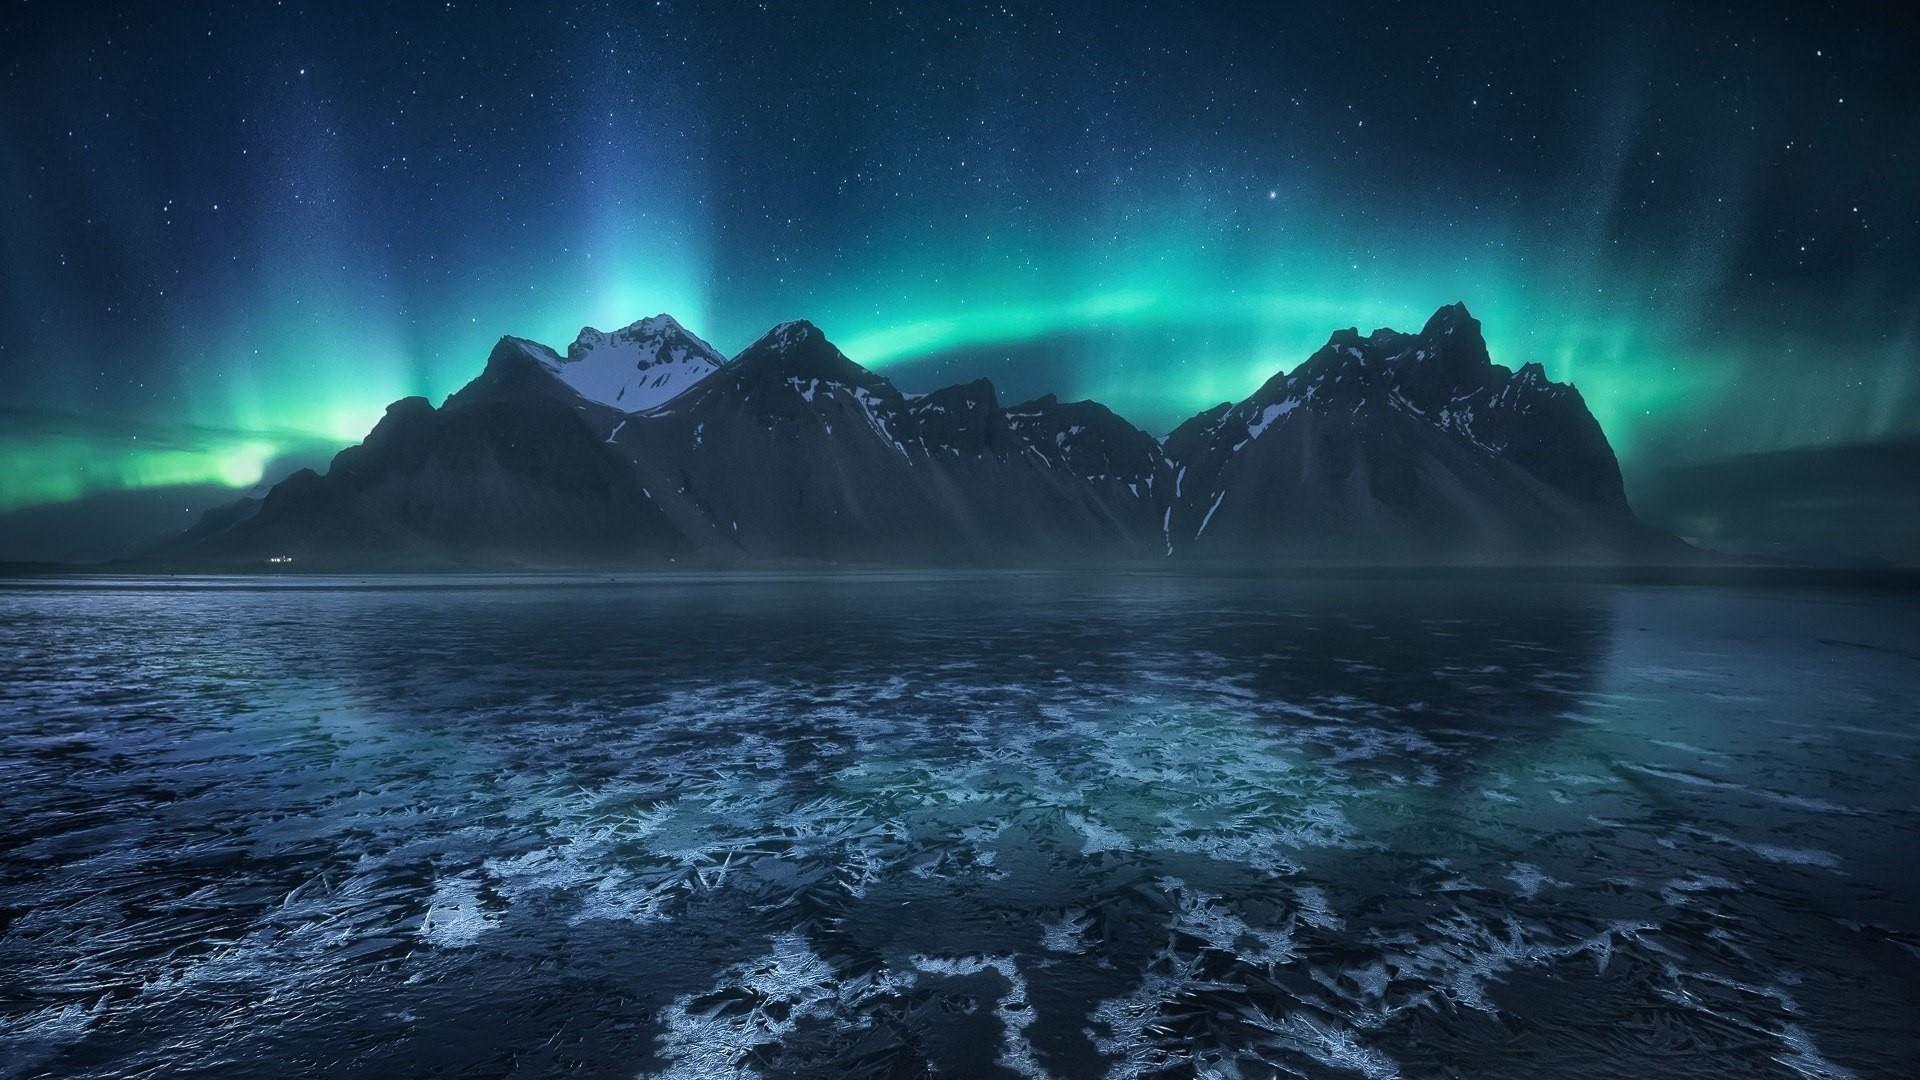 Hd Wallpaper Aurora 2020 Live Wallpaper Hd Landscape Photography Northern Lights Aurora Boreal